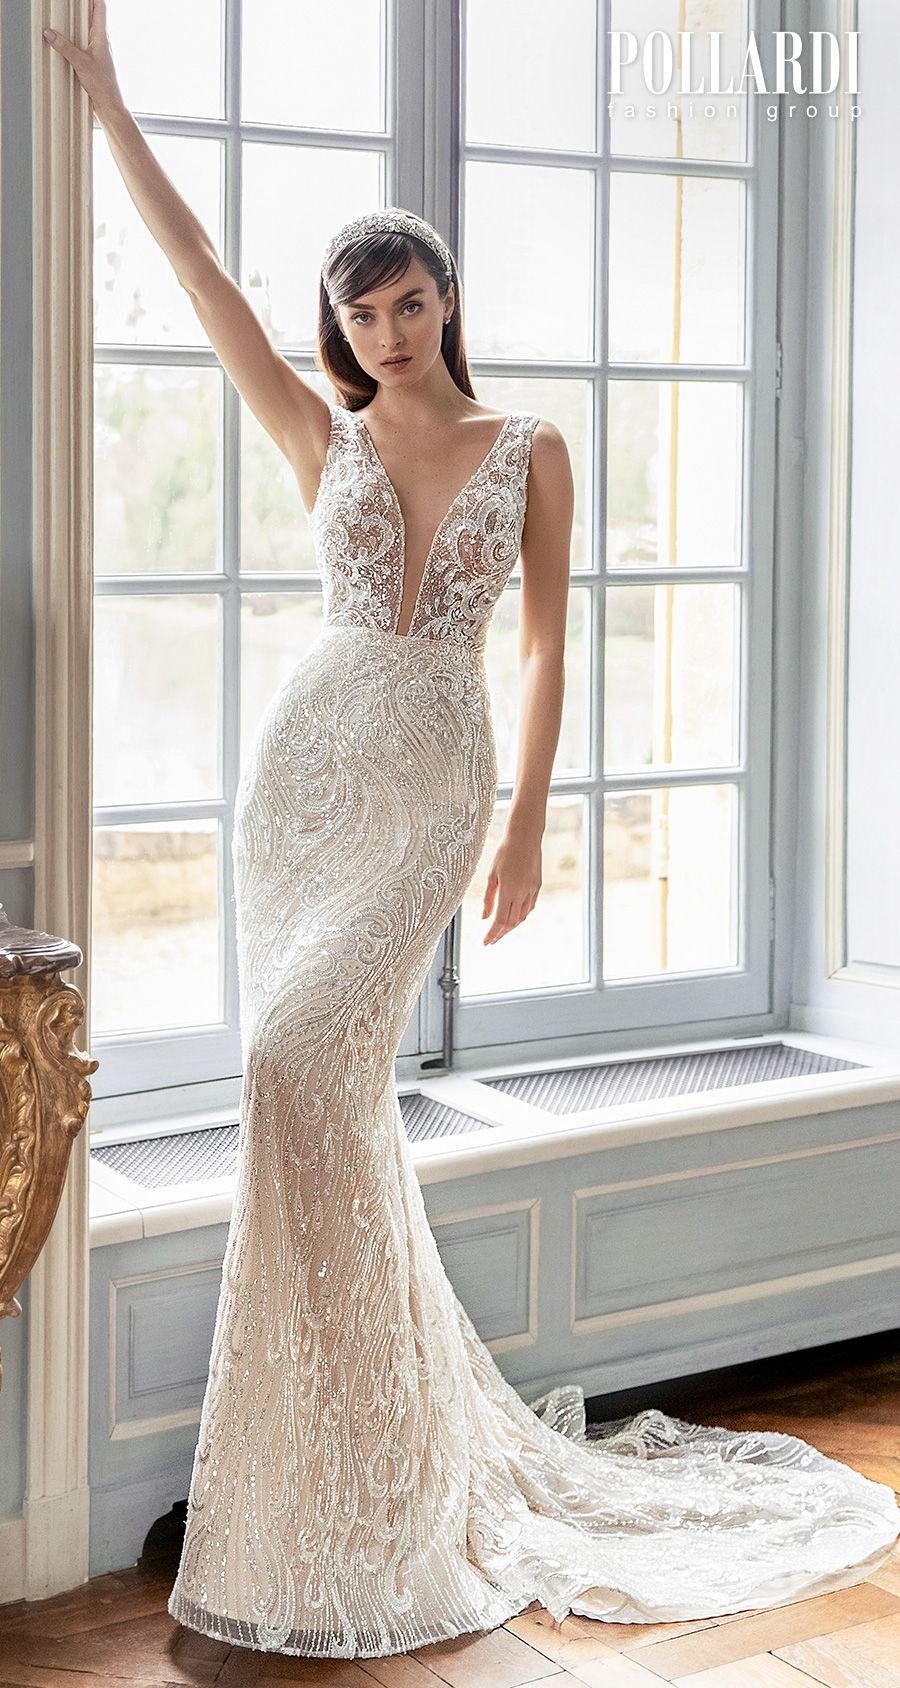 pollardi 2021 royalty bridal sleeveless deep plunging v neck full embellishment elegant glamorous sheath fit and flare wedding dress v back short train (jolie) mv